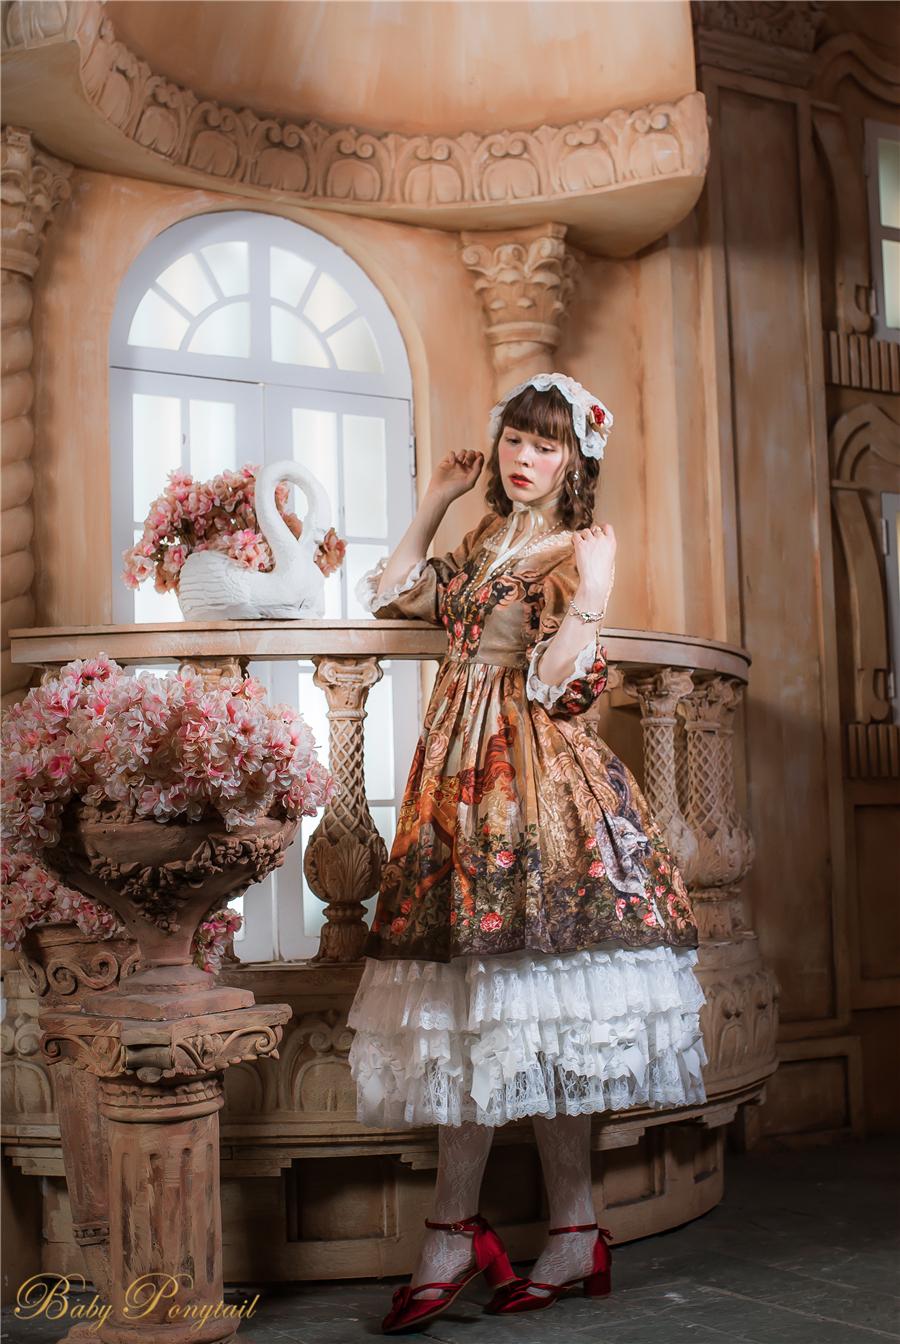 BabyPonytail_Rose Battle_Model Photo_OP Amber Studio_Claudia_01.jpg